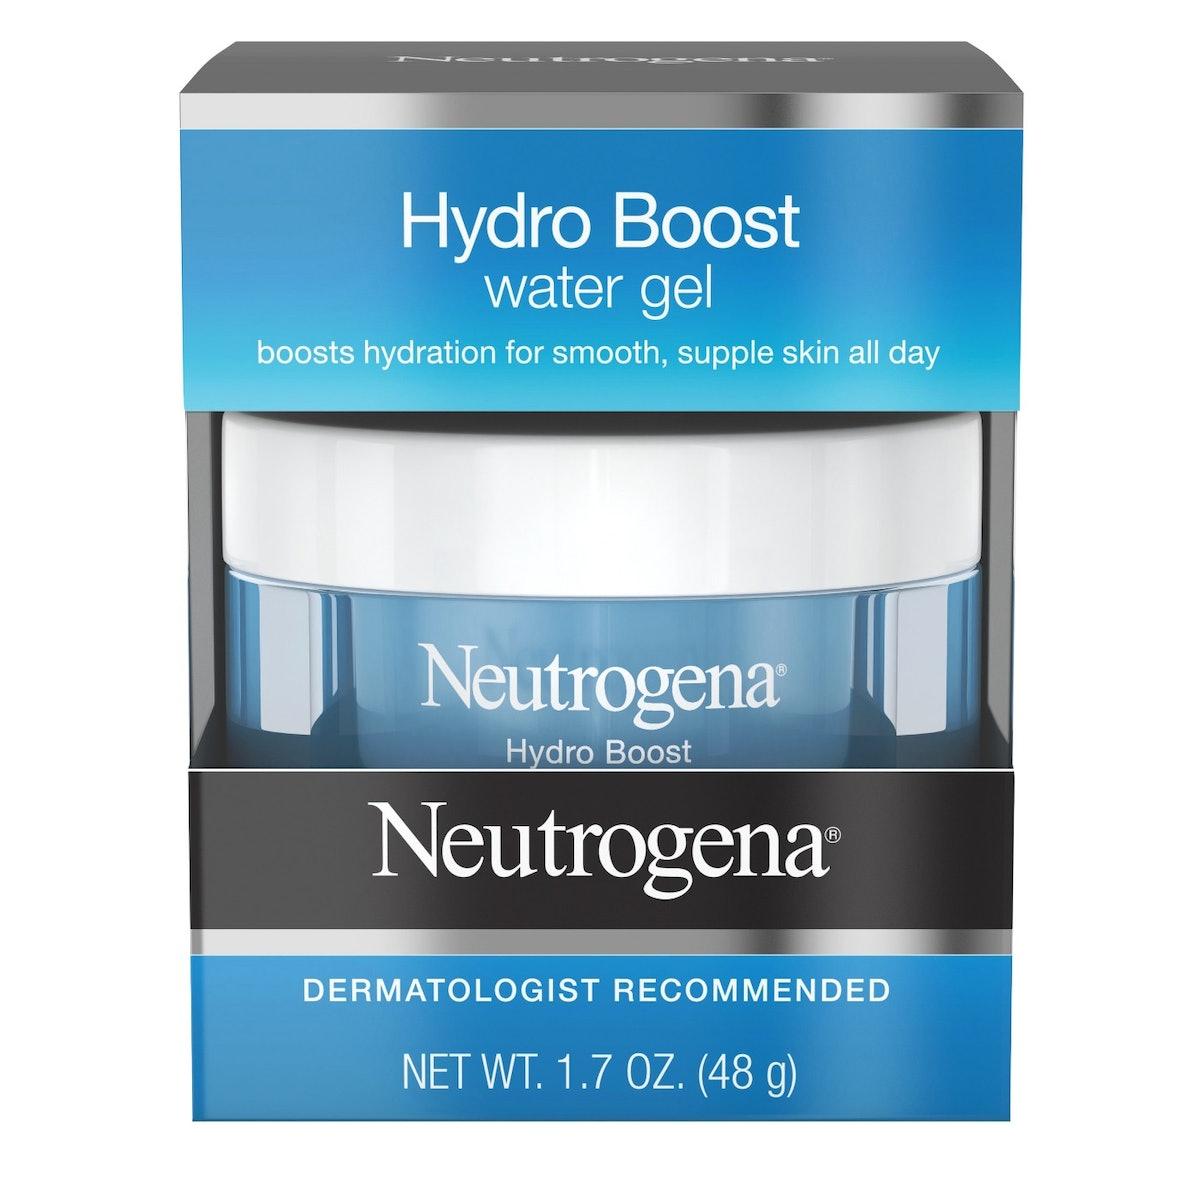 Neutrogena Hydro Boost Hydrating Water Gel Face Moisturizer - 1.7 fl. oz.